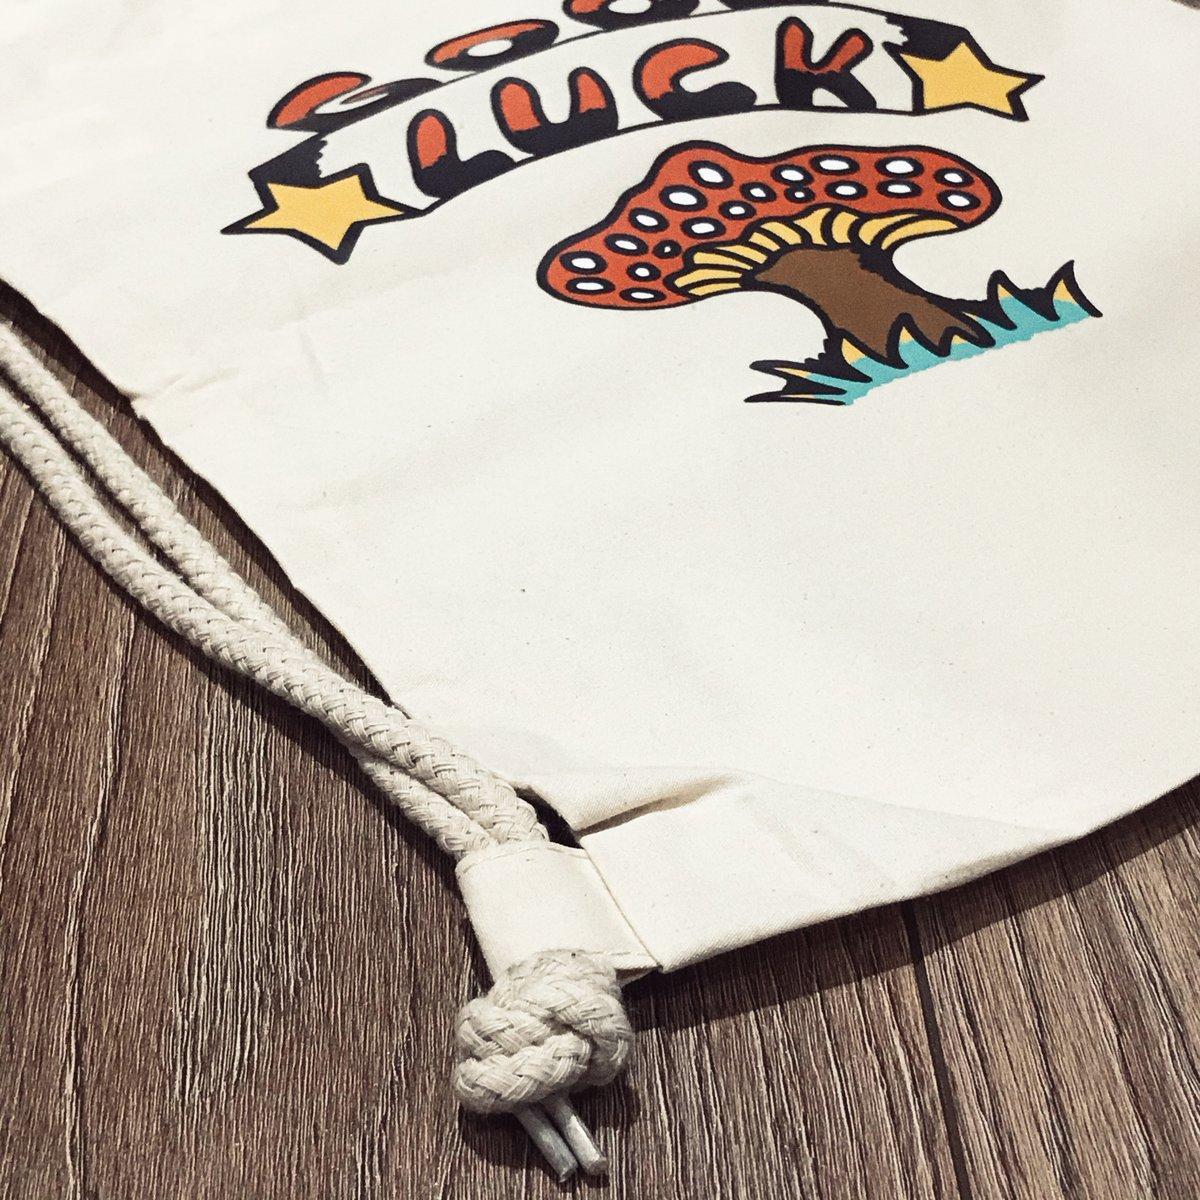 Image of Good Luck Drawstring Bag